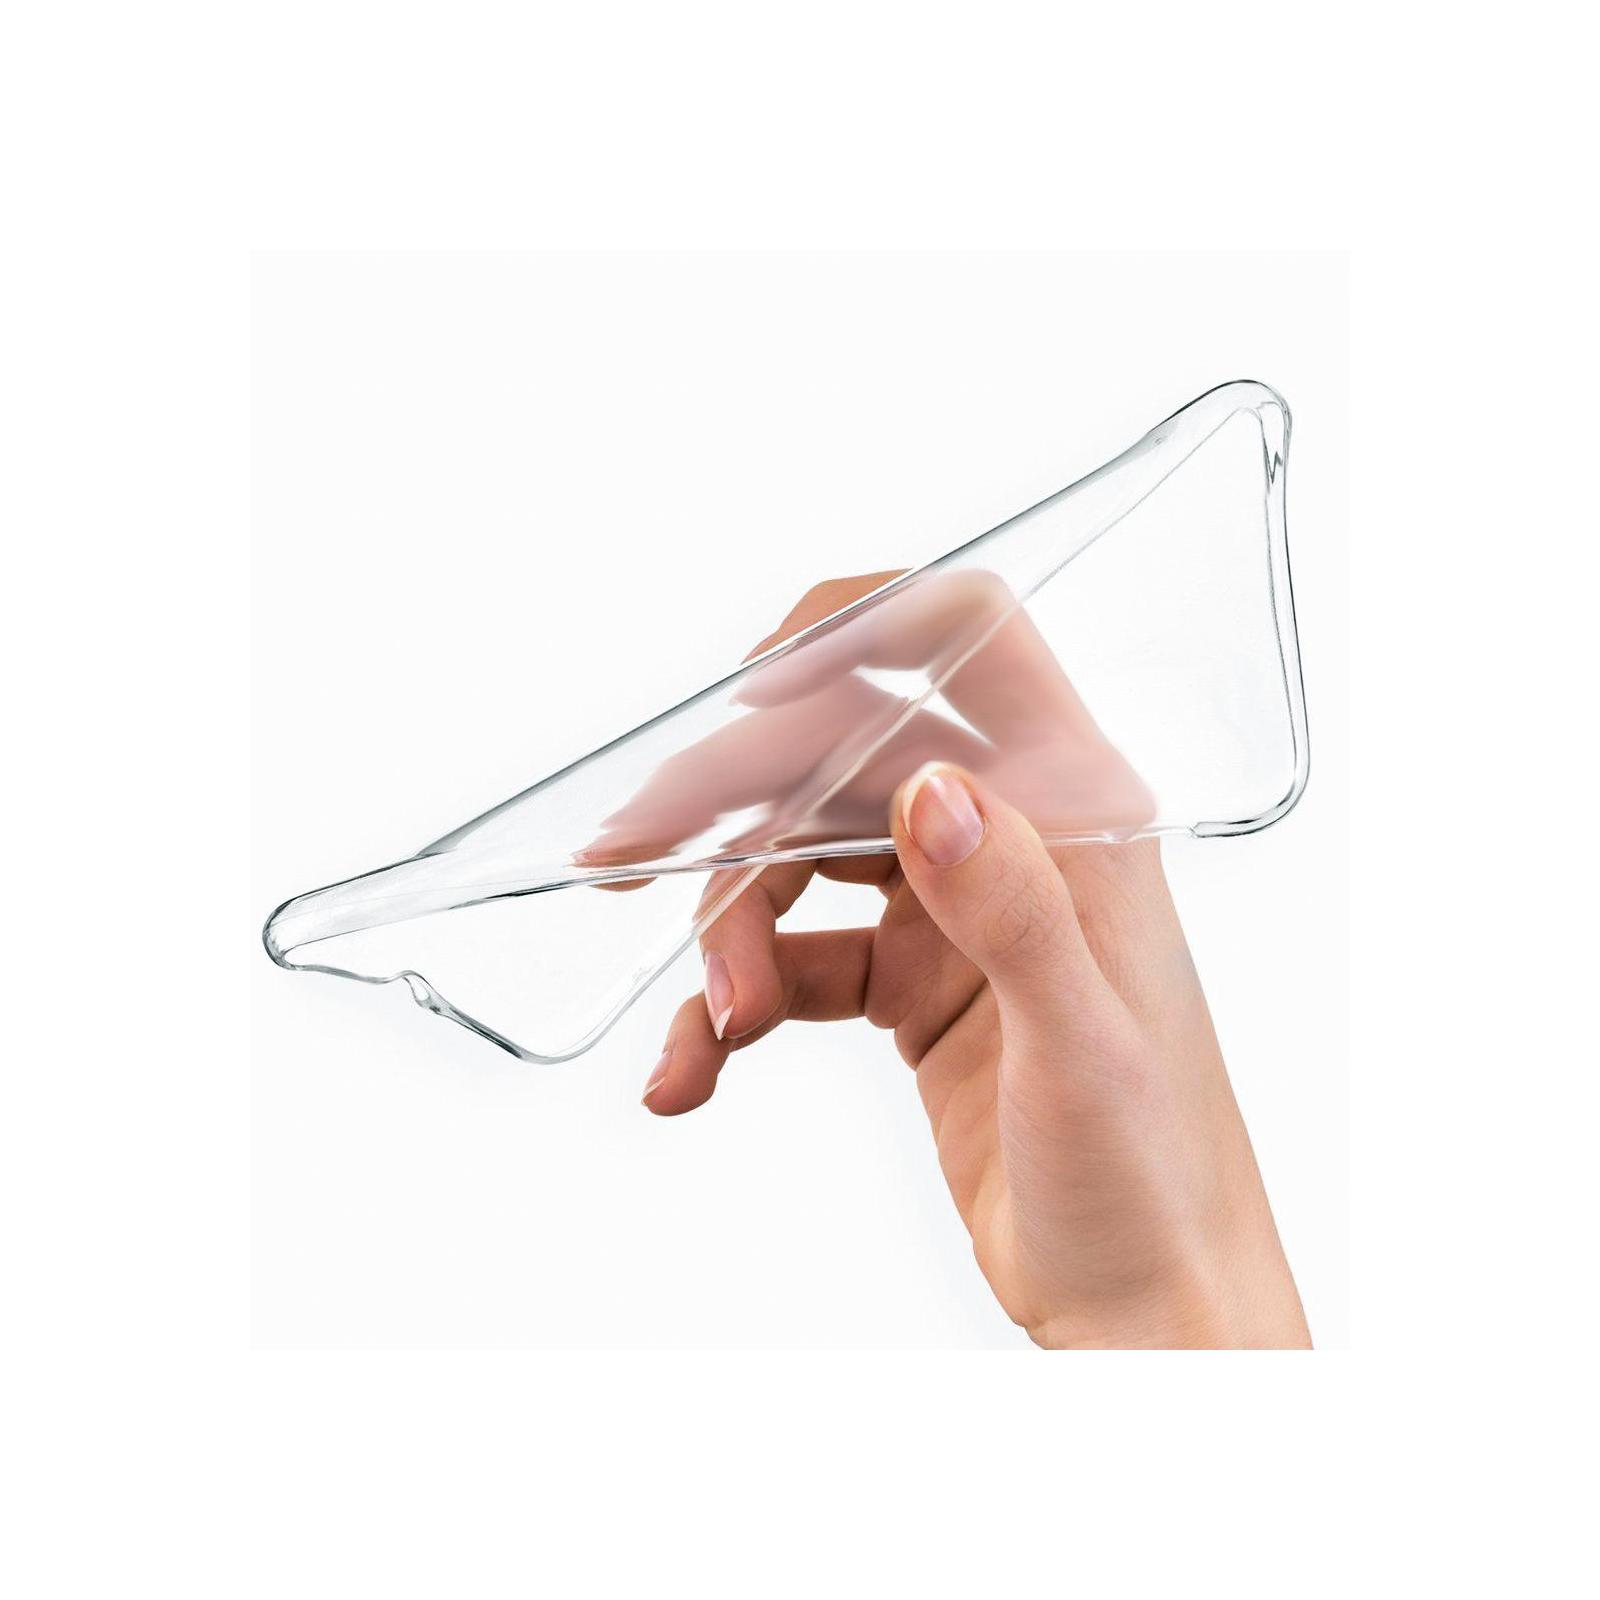 Чехол для моб. телефона SmartCase Xiaomi Redmi 4A TPU Clear (SC-RMI4A) изображение 5